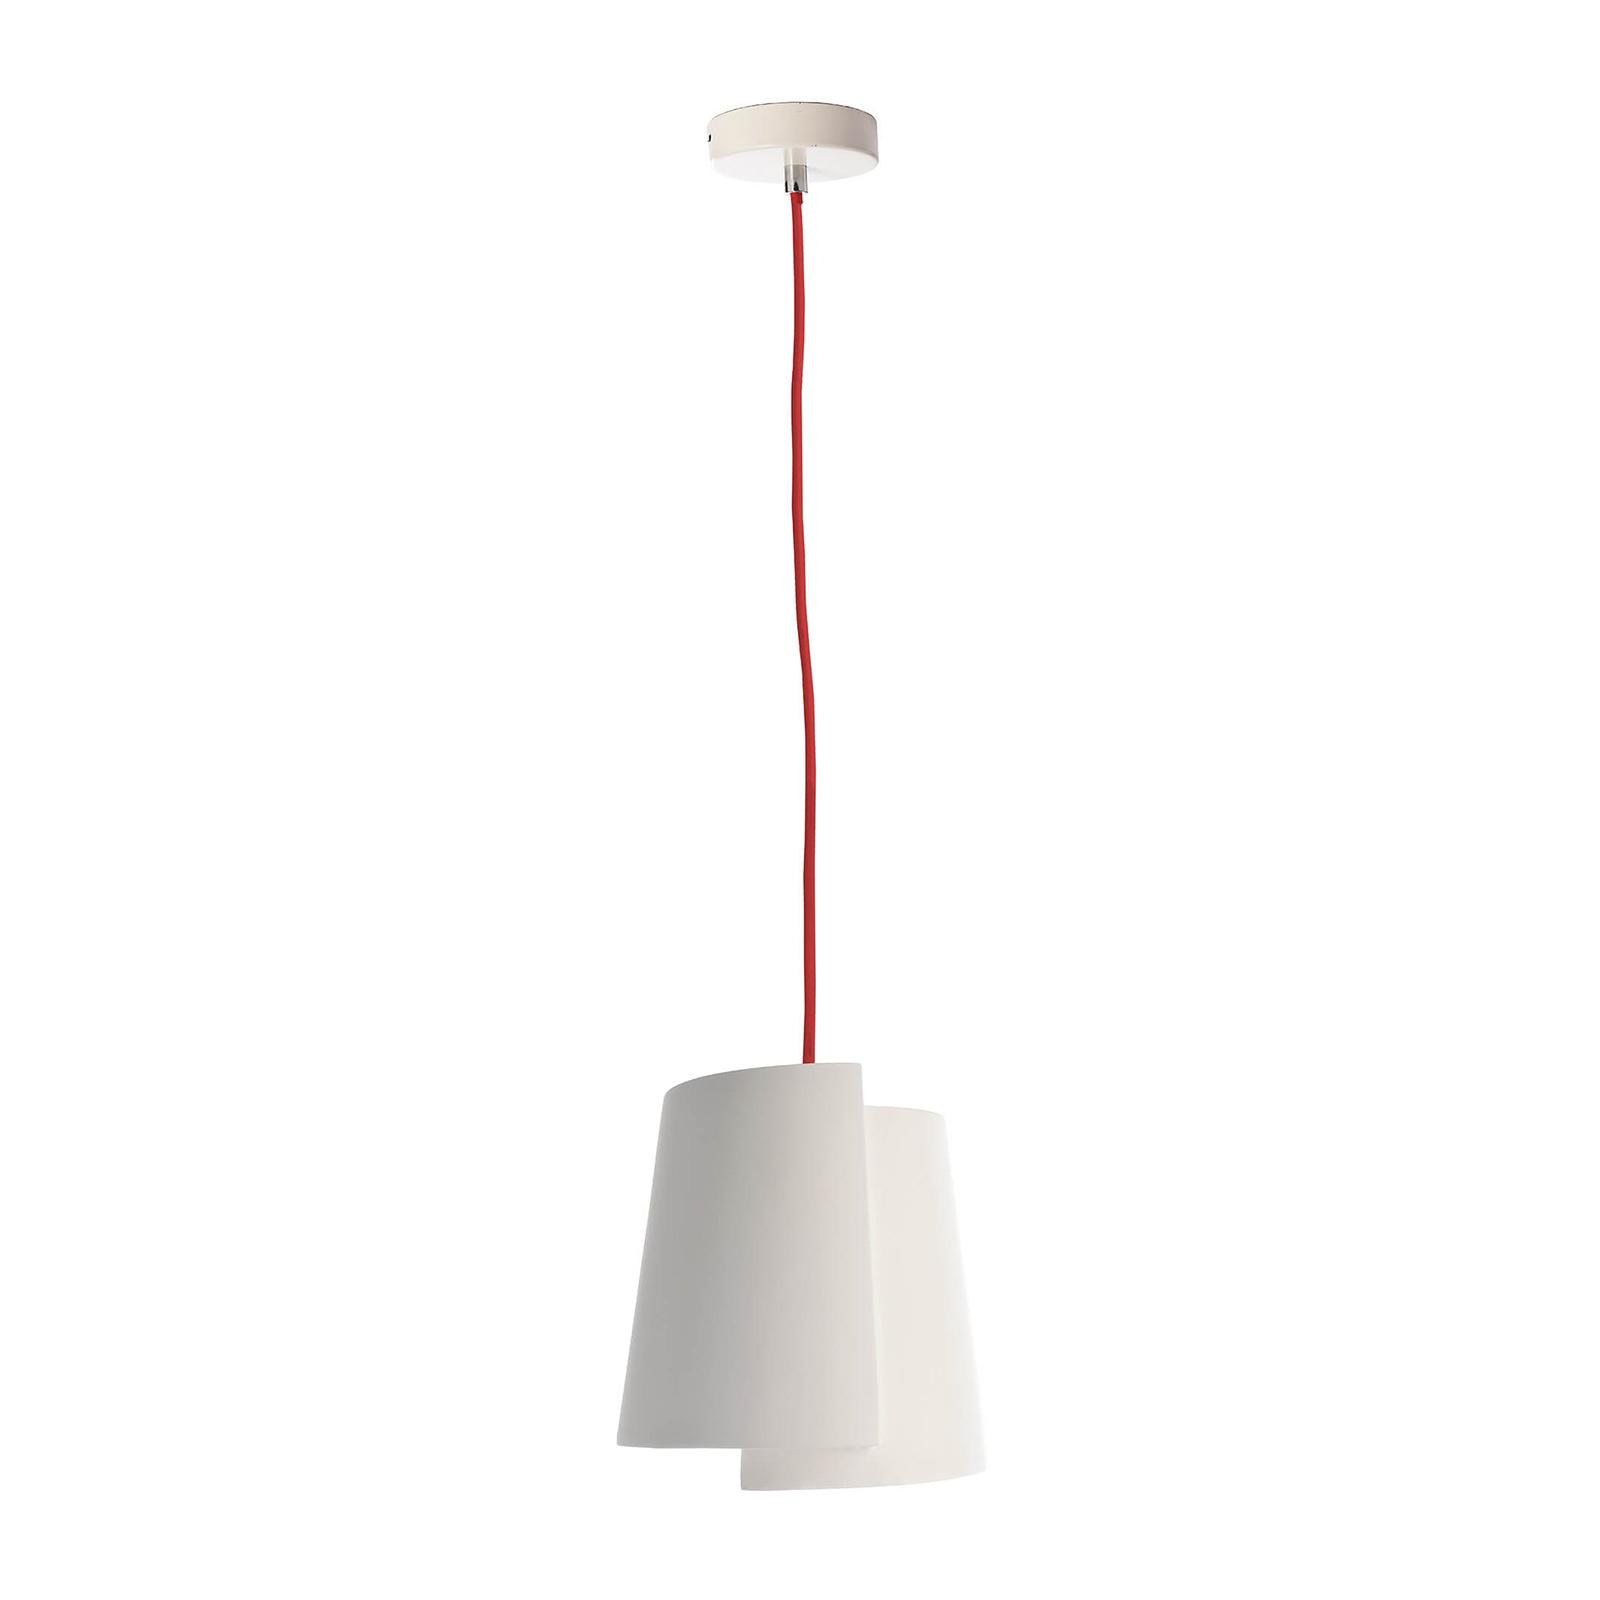 Hanglamp Twister II, wit, Ø 28 cm